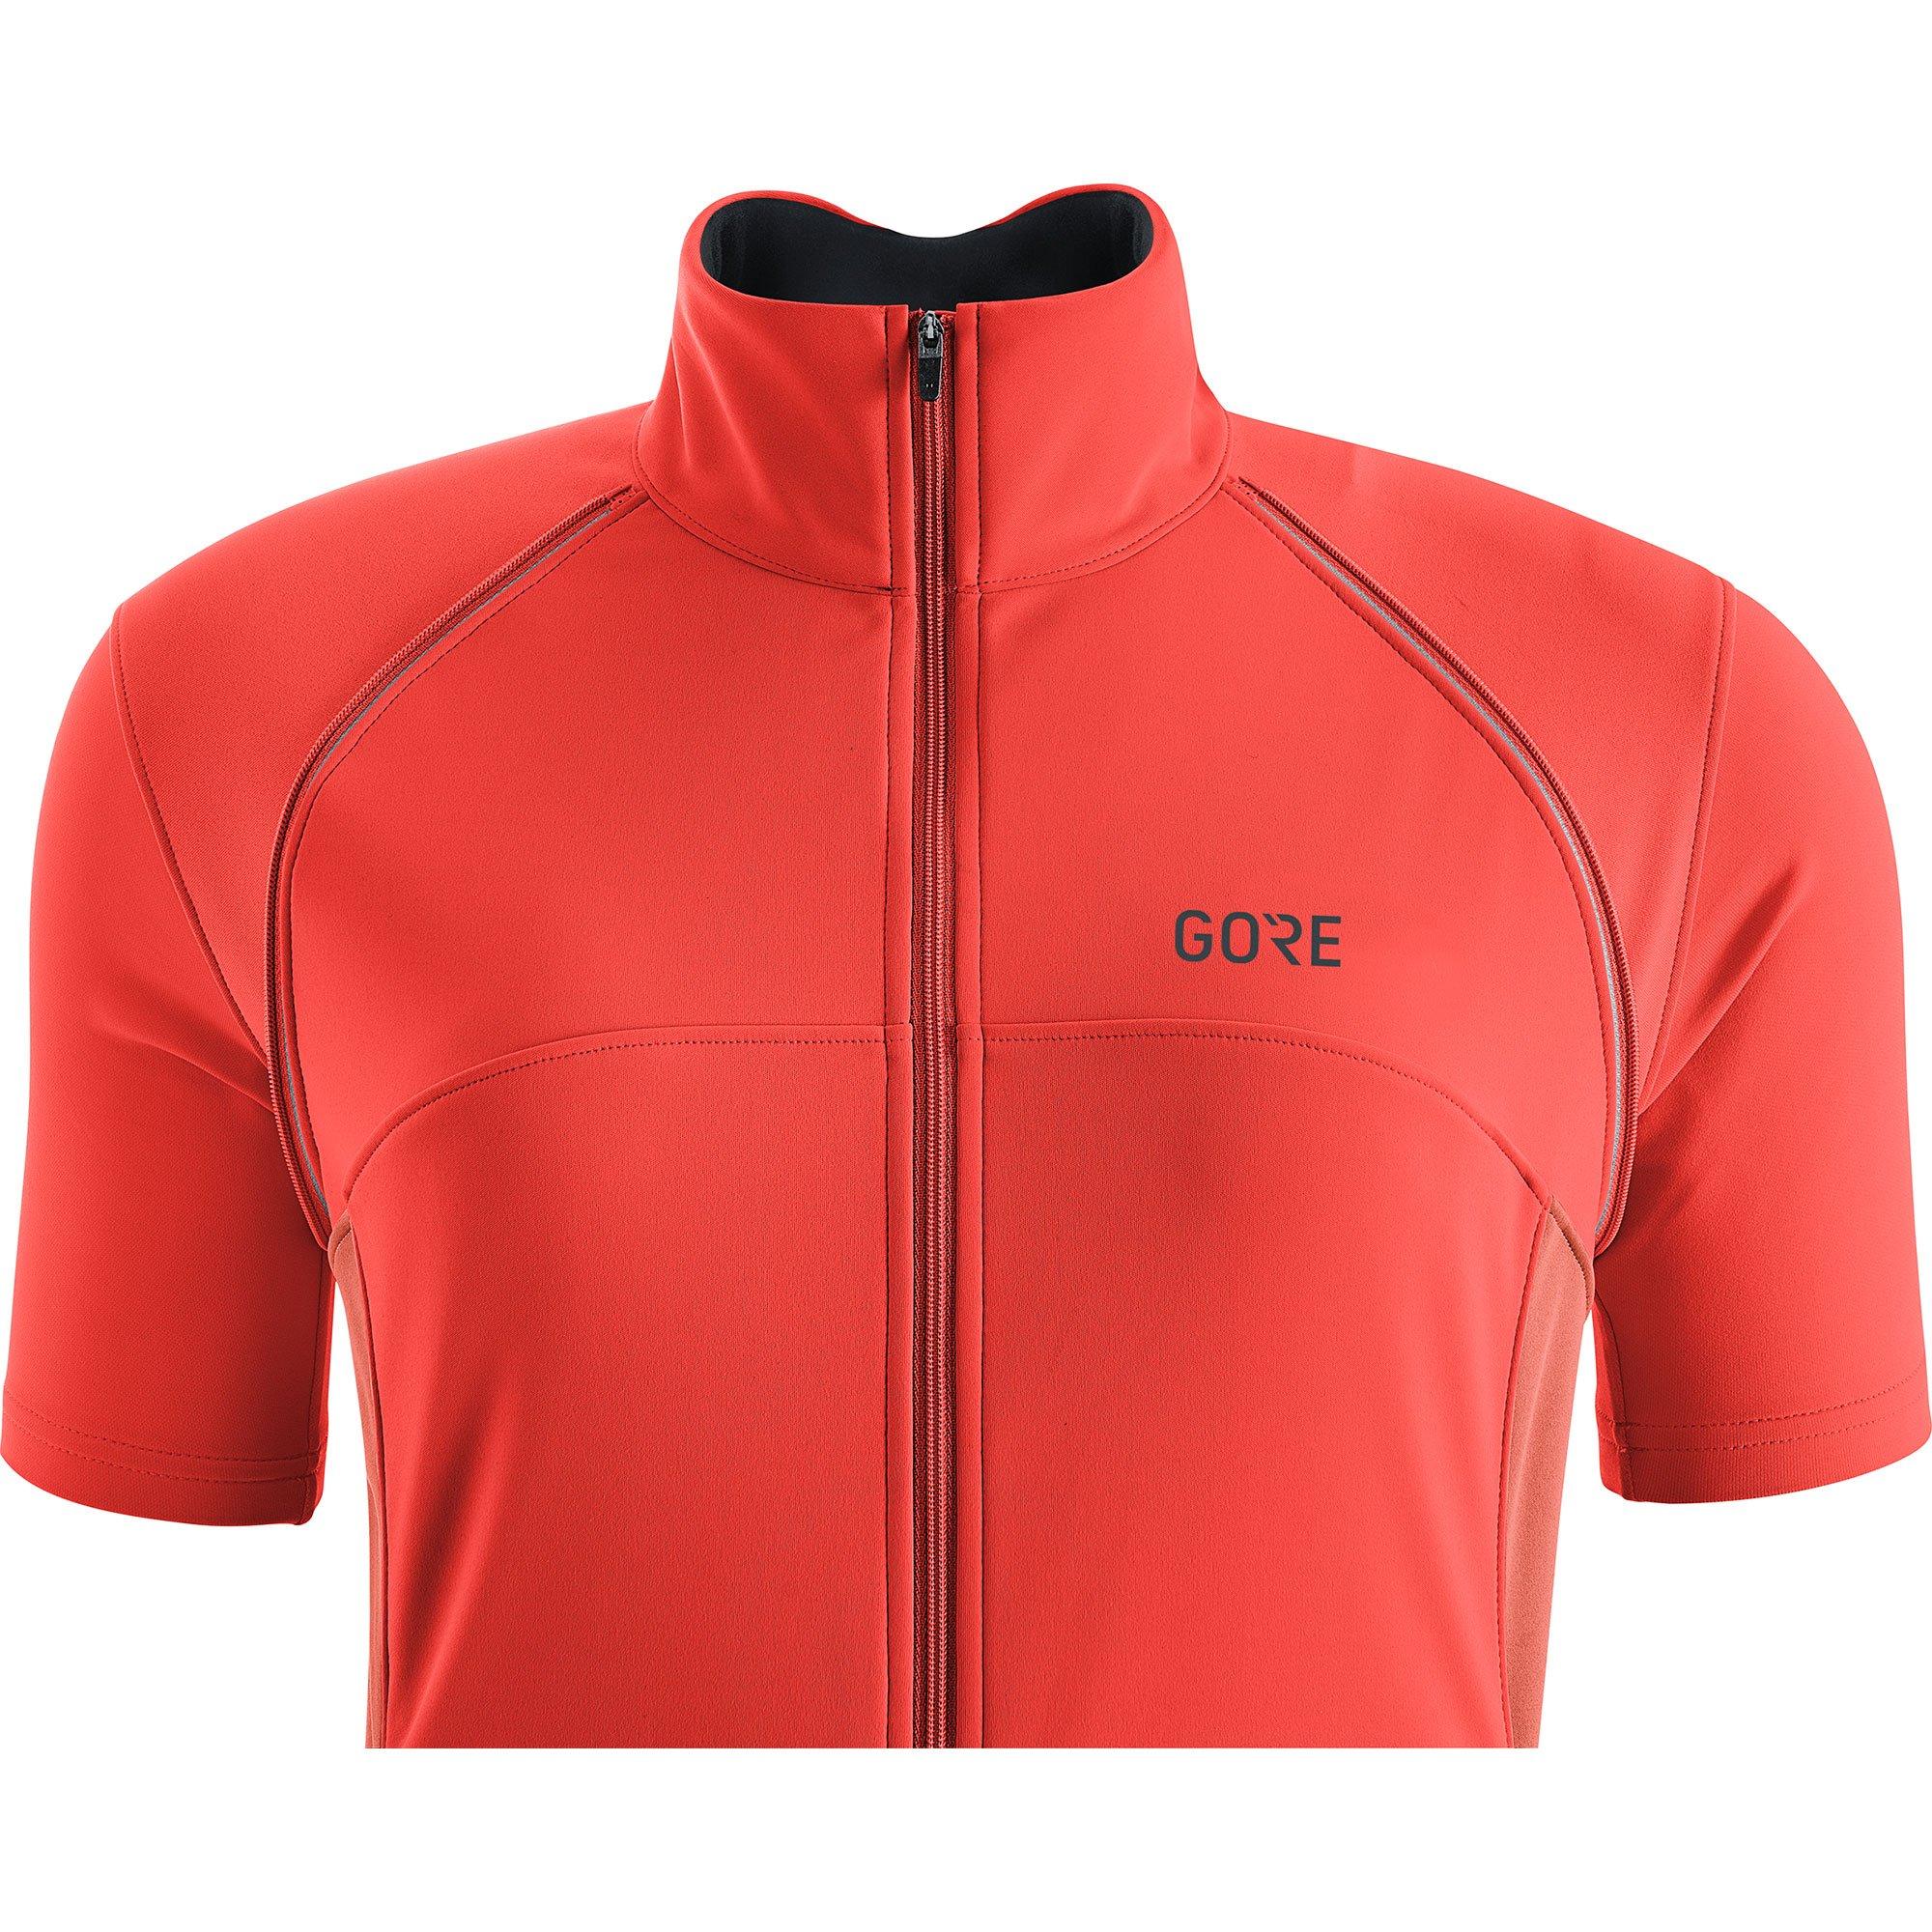 GORE Wear Women's Windproof Cycling Jacket, Removable Sleeves, GORE Wear C3 Women's GORE Wear WINDSTOPPER Phantom Zip-Off Jacket, Size: L, Color: Lumi Orange/Coral Glow, 100191 by GORE WEAR (Image #5)